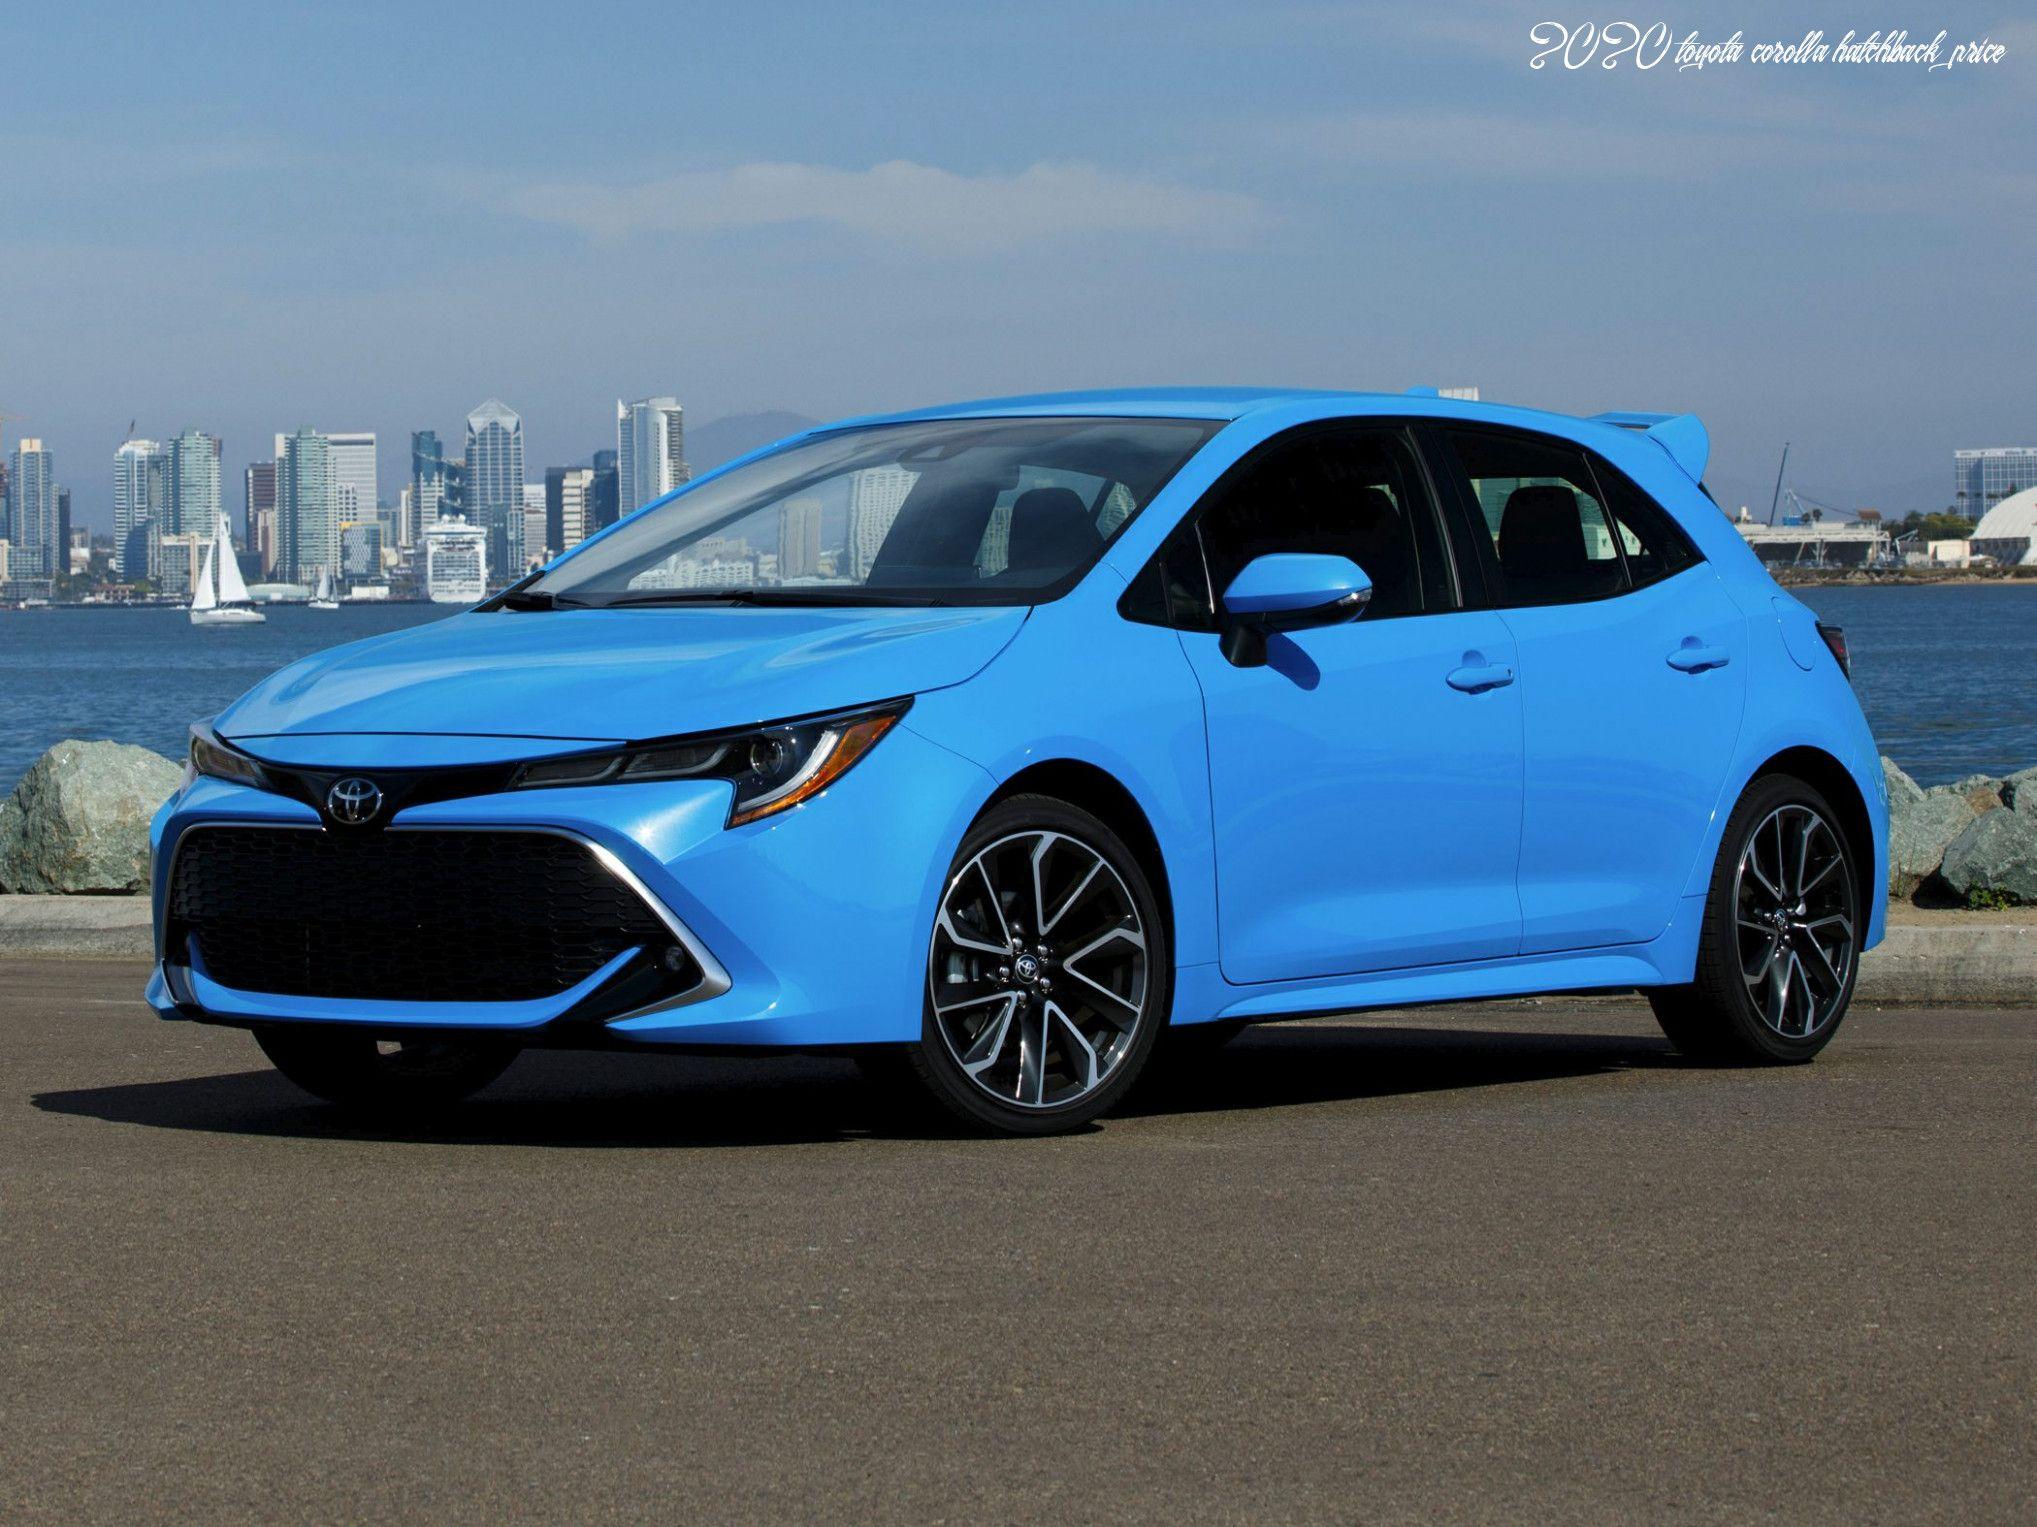 2020 Toyota Corolla Hatchback Price Redesign And Review In 2020 Toyota Corolla Hatchback Corolla Hatchback Toyota Corolla